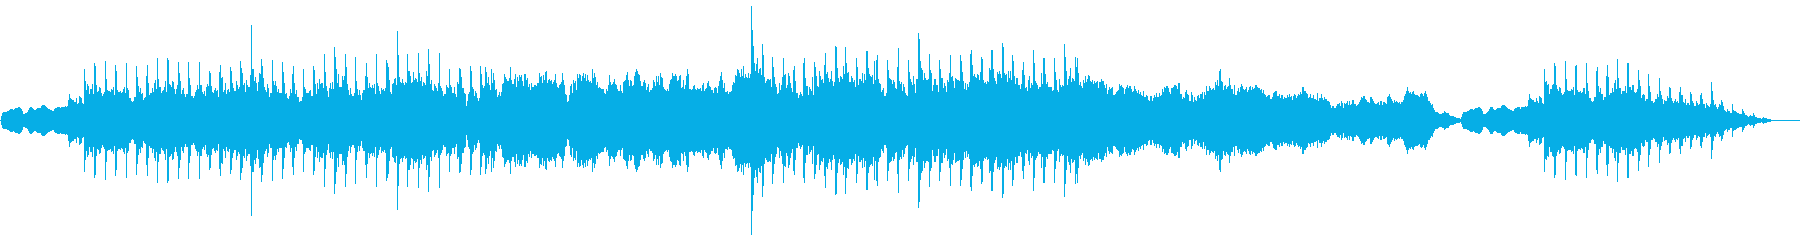 RPG:ダンジョン用BGM4の再生済みの波形